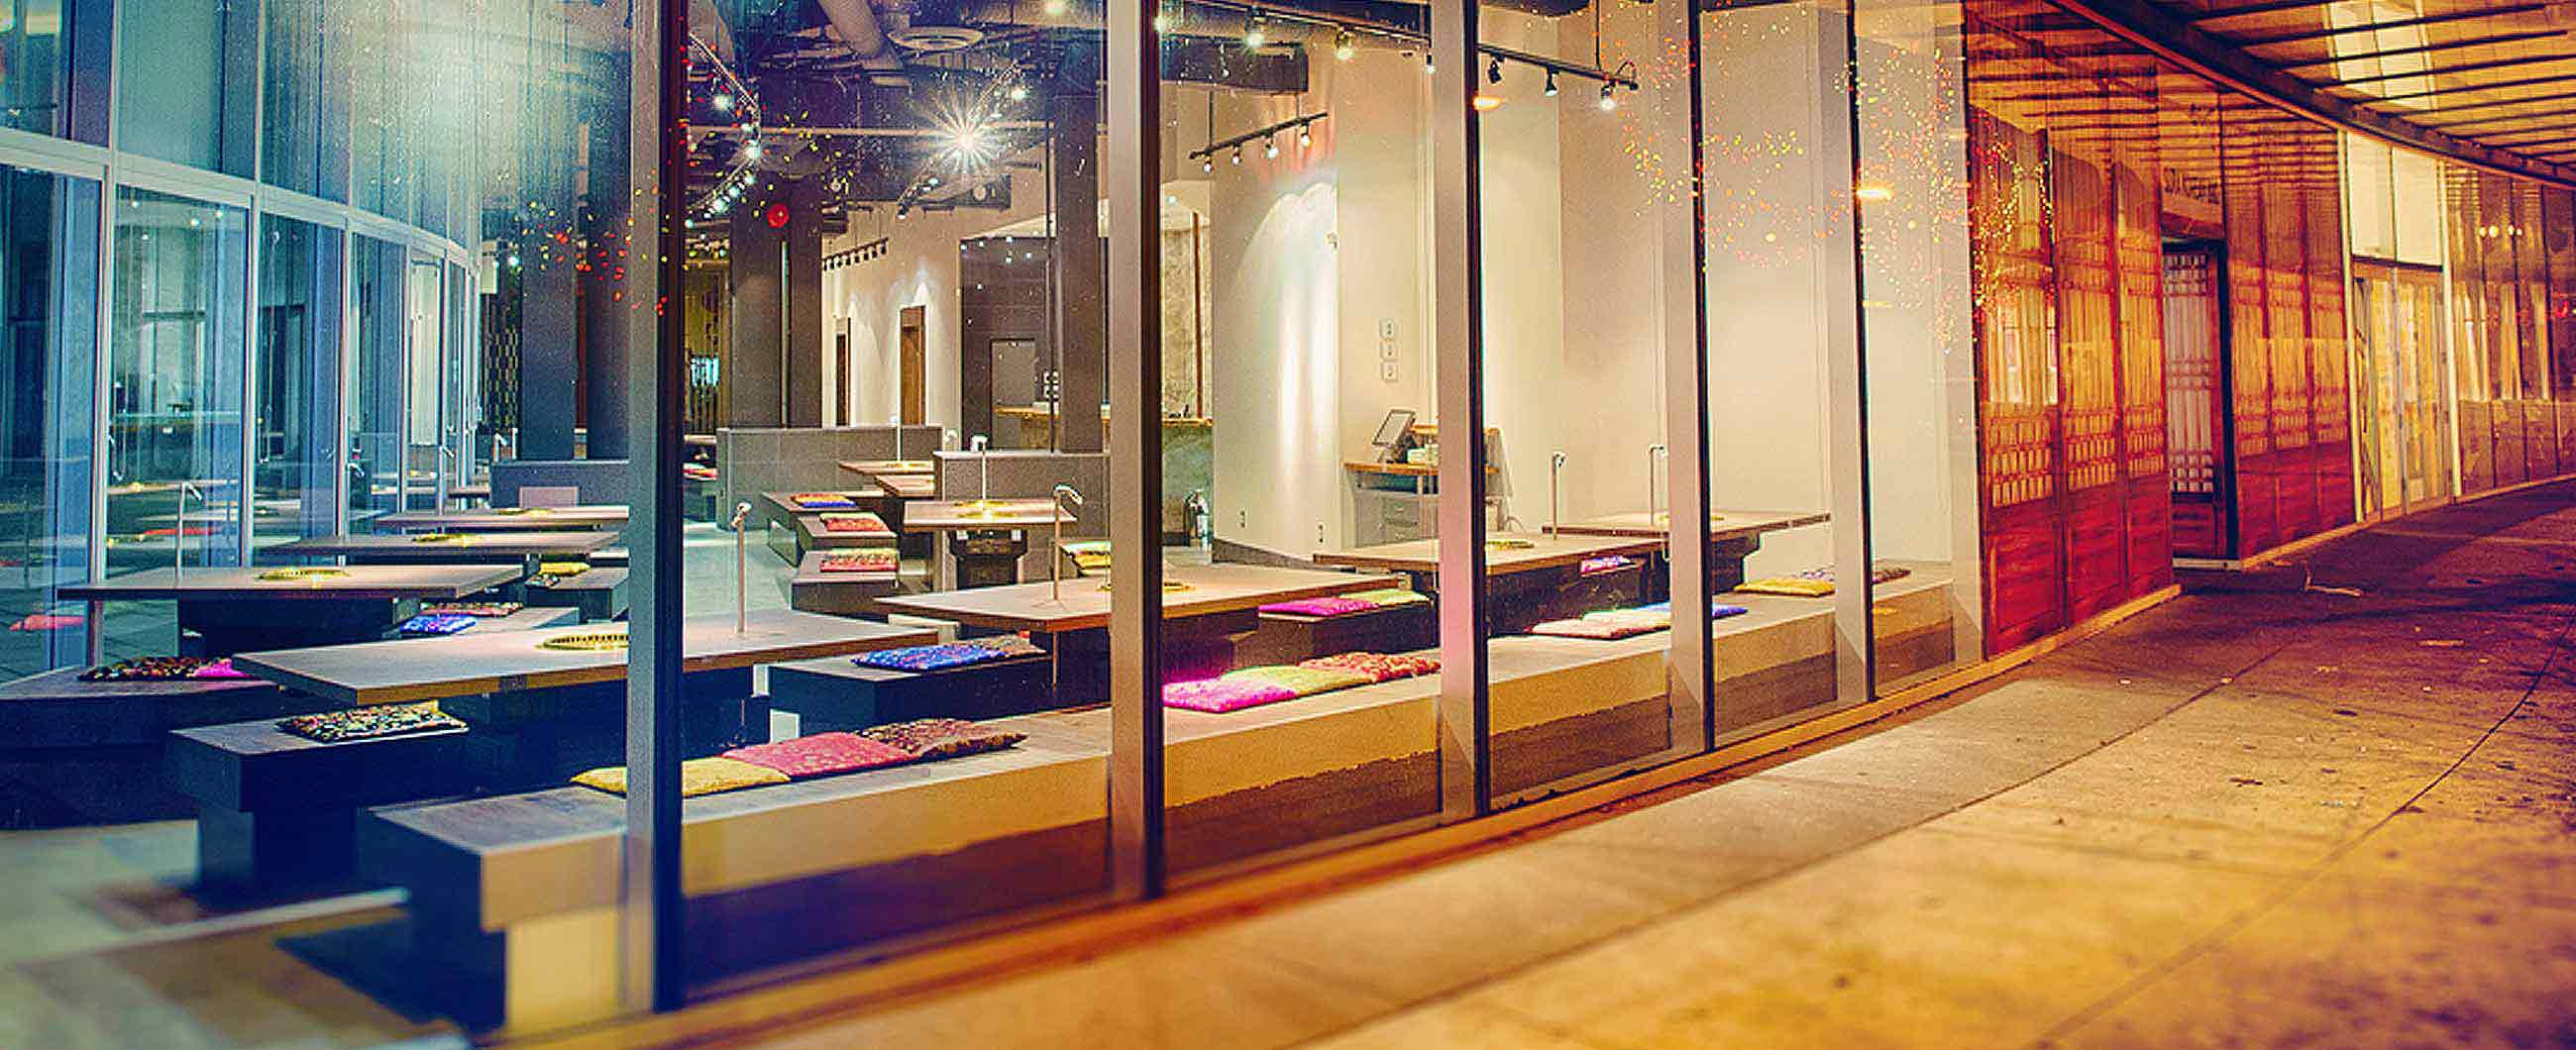 sura korean bbq restaurant about richmond bc canada. Black Bedroom Furniture Sets. Home Design Ideas